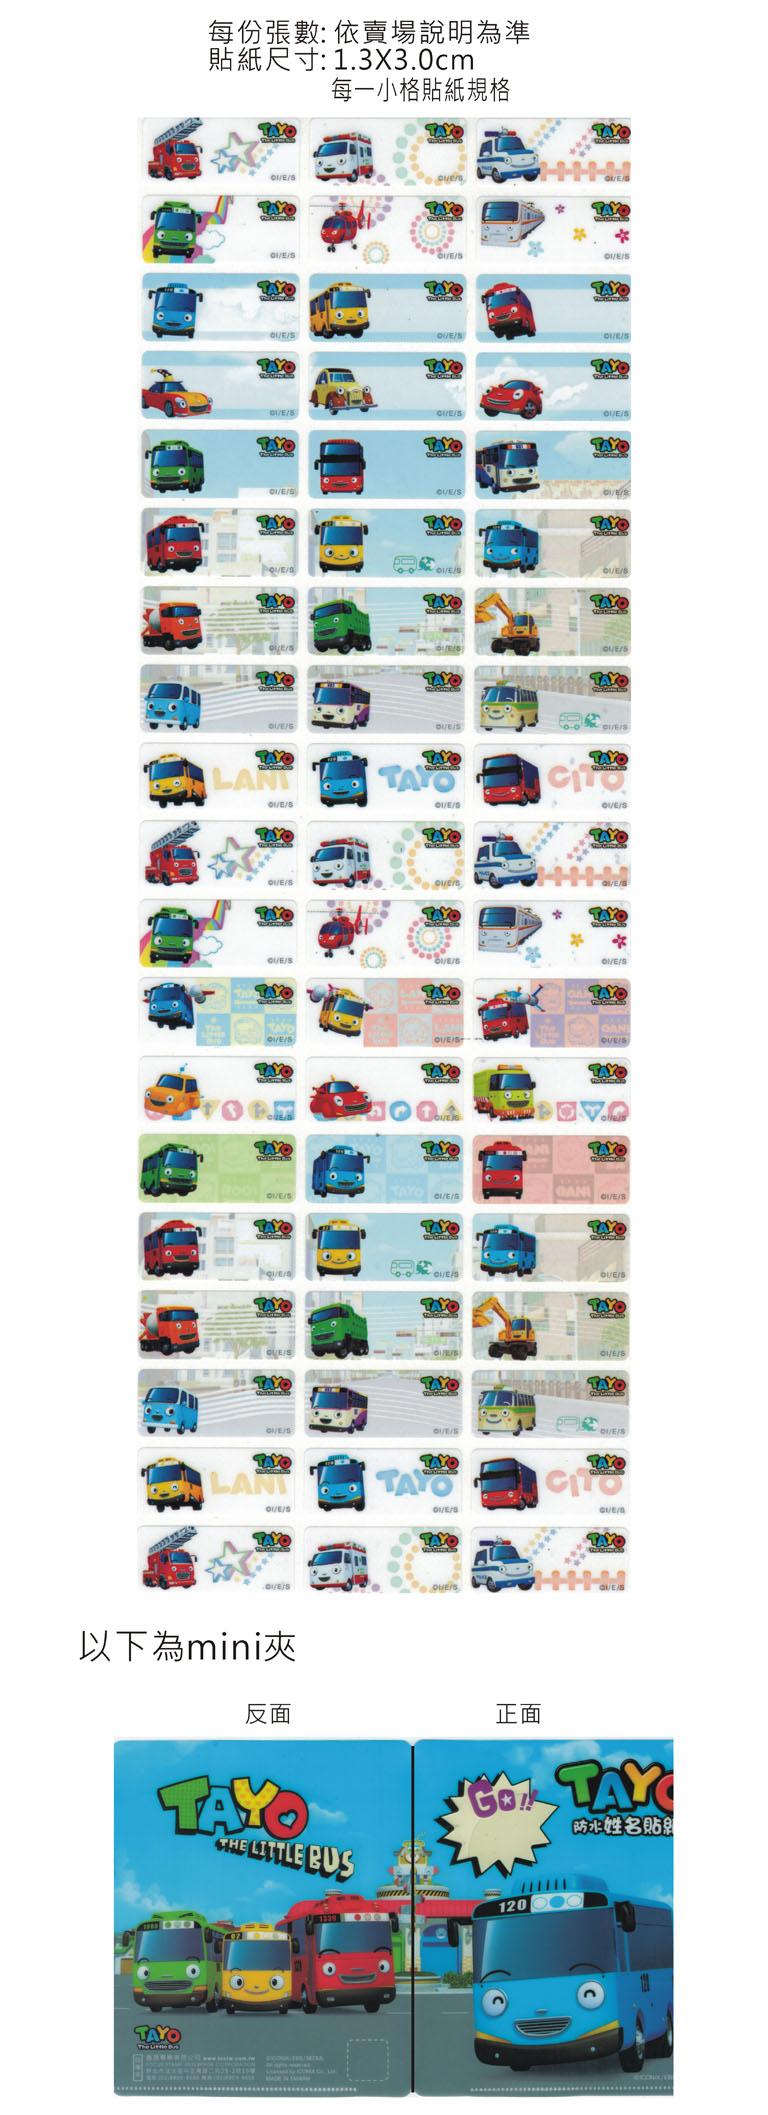 TAYO小巴士-中型款姓名貼紙